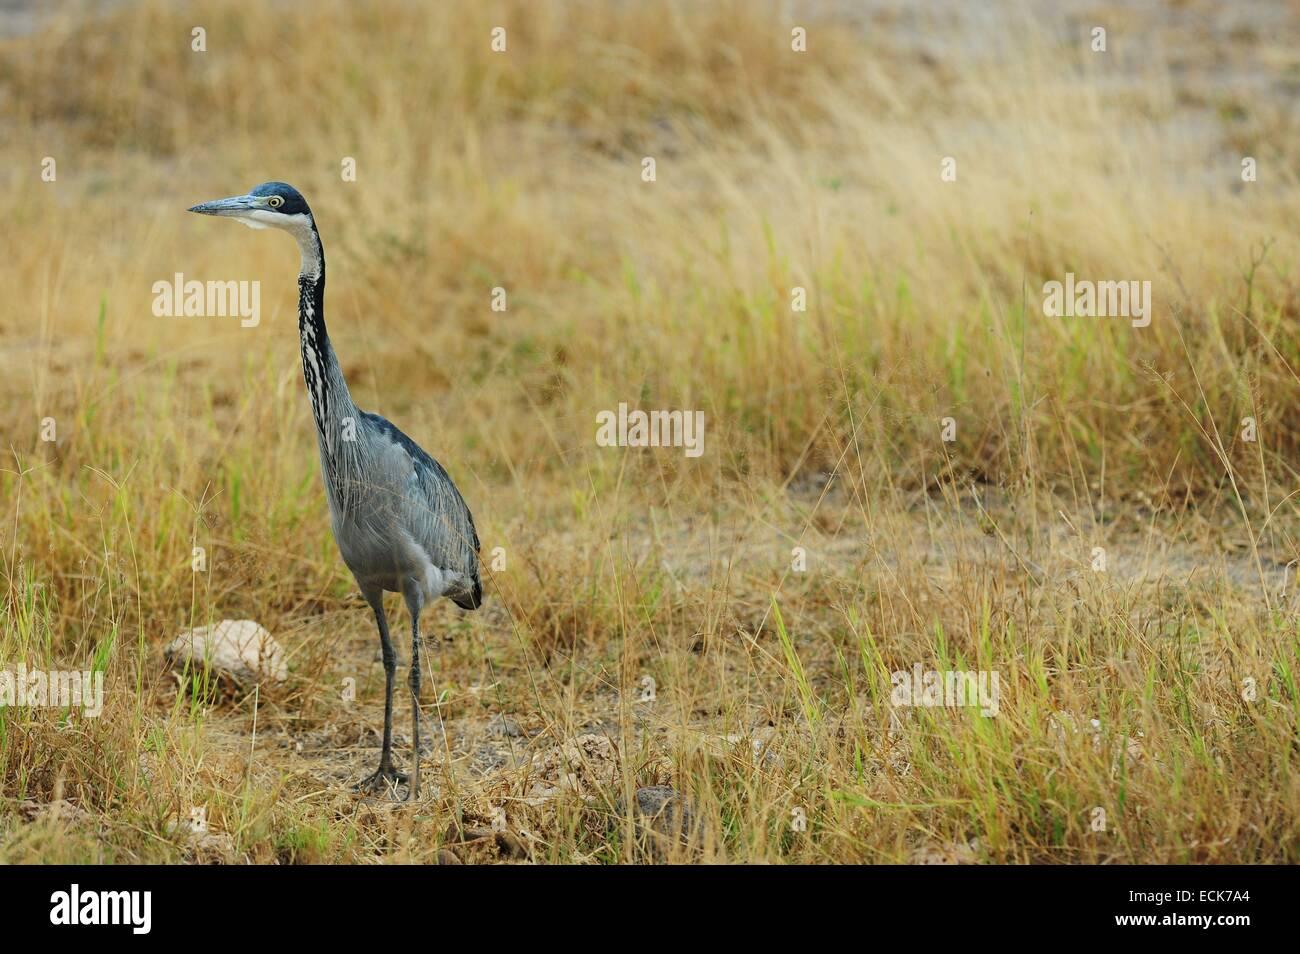 Kenya, Amboseli National Park, Black-Headed Heron (Ardea melanocephala) - Stock Image